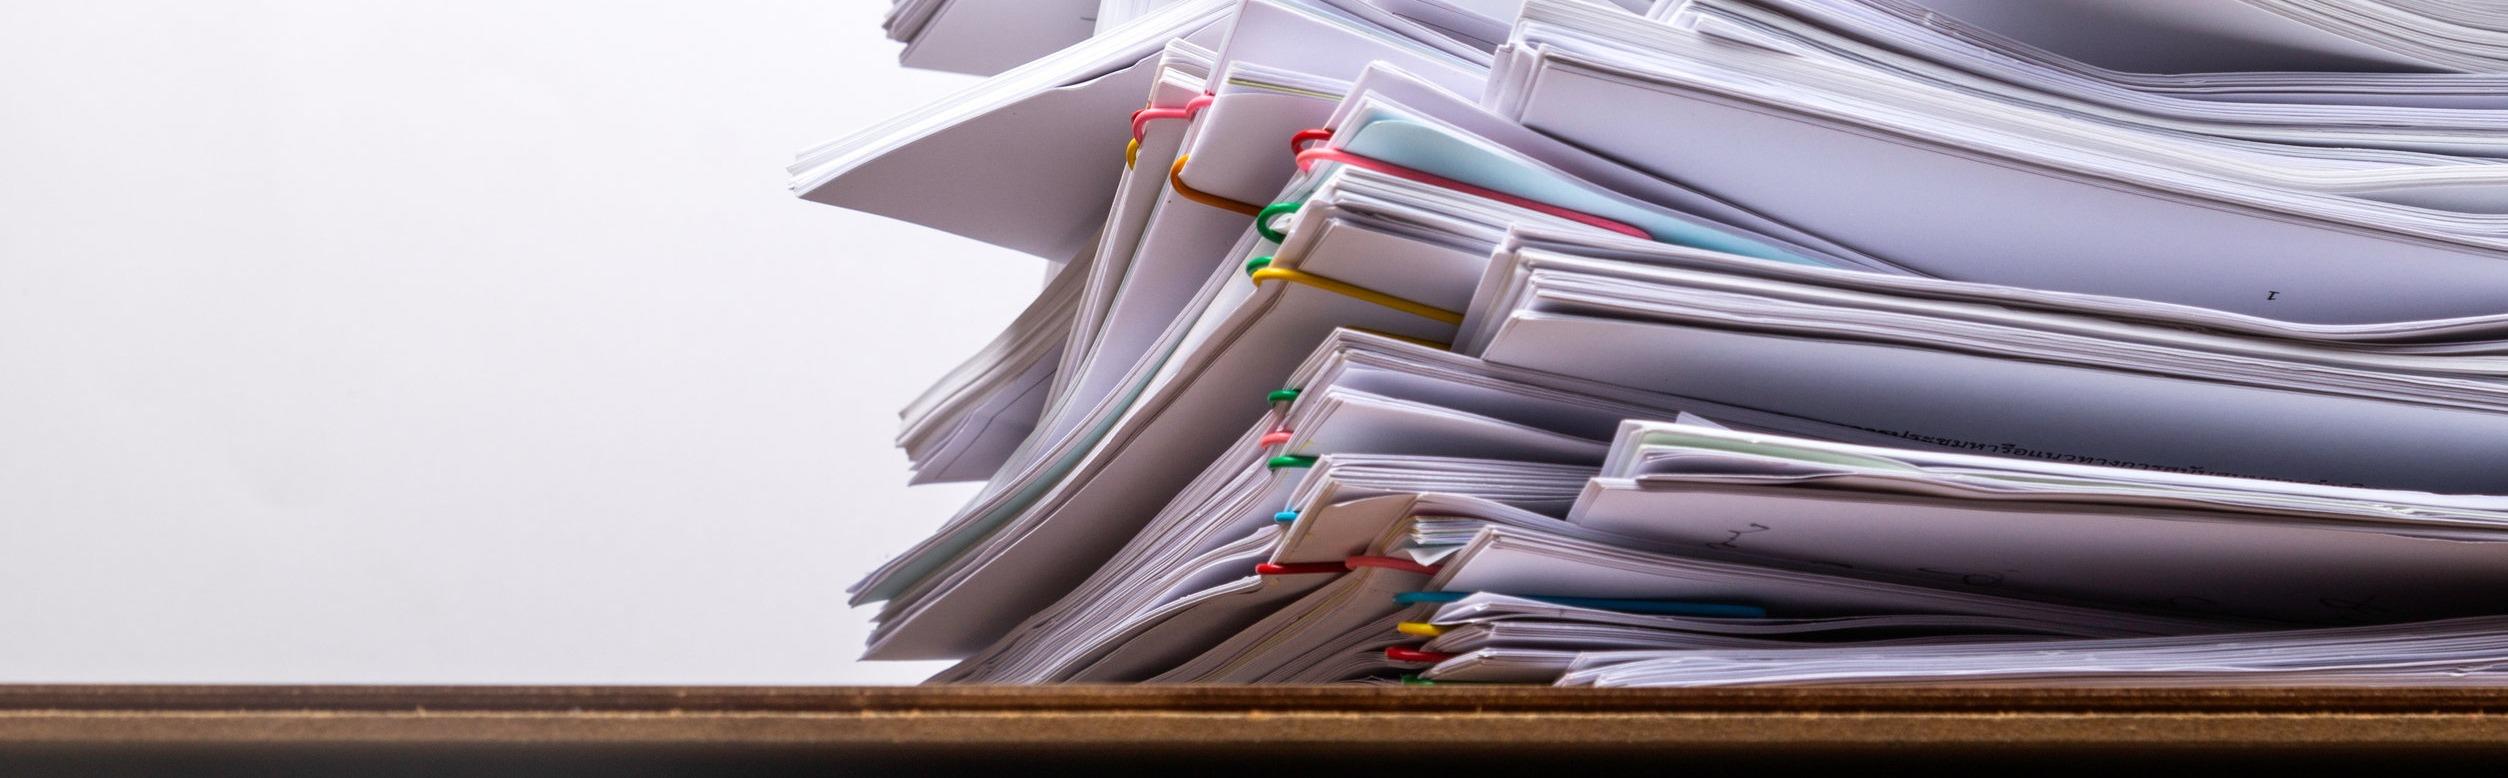 documents-header